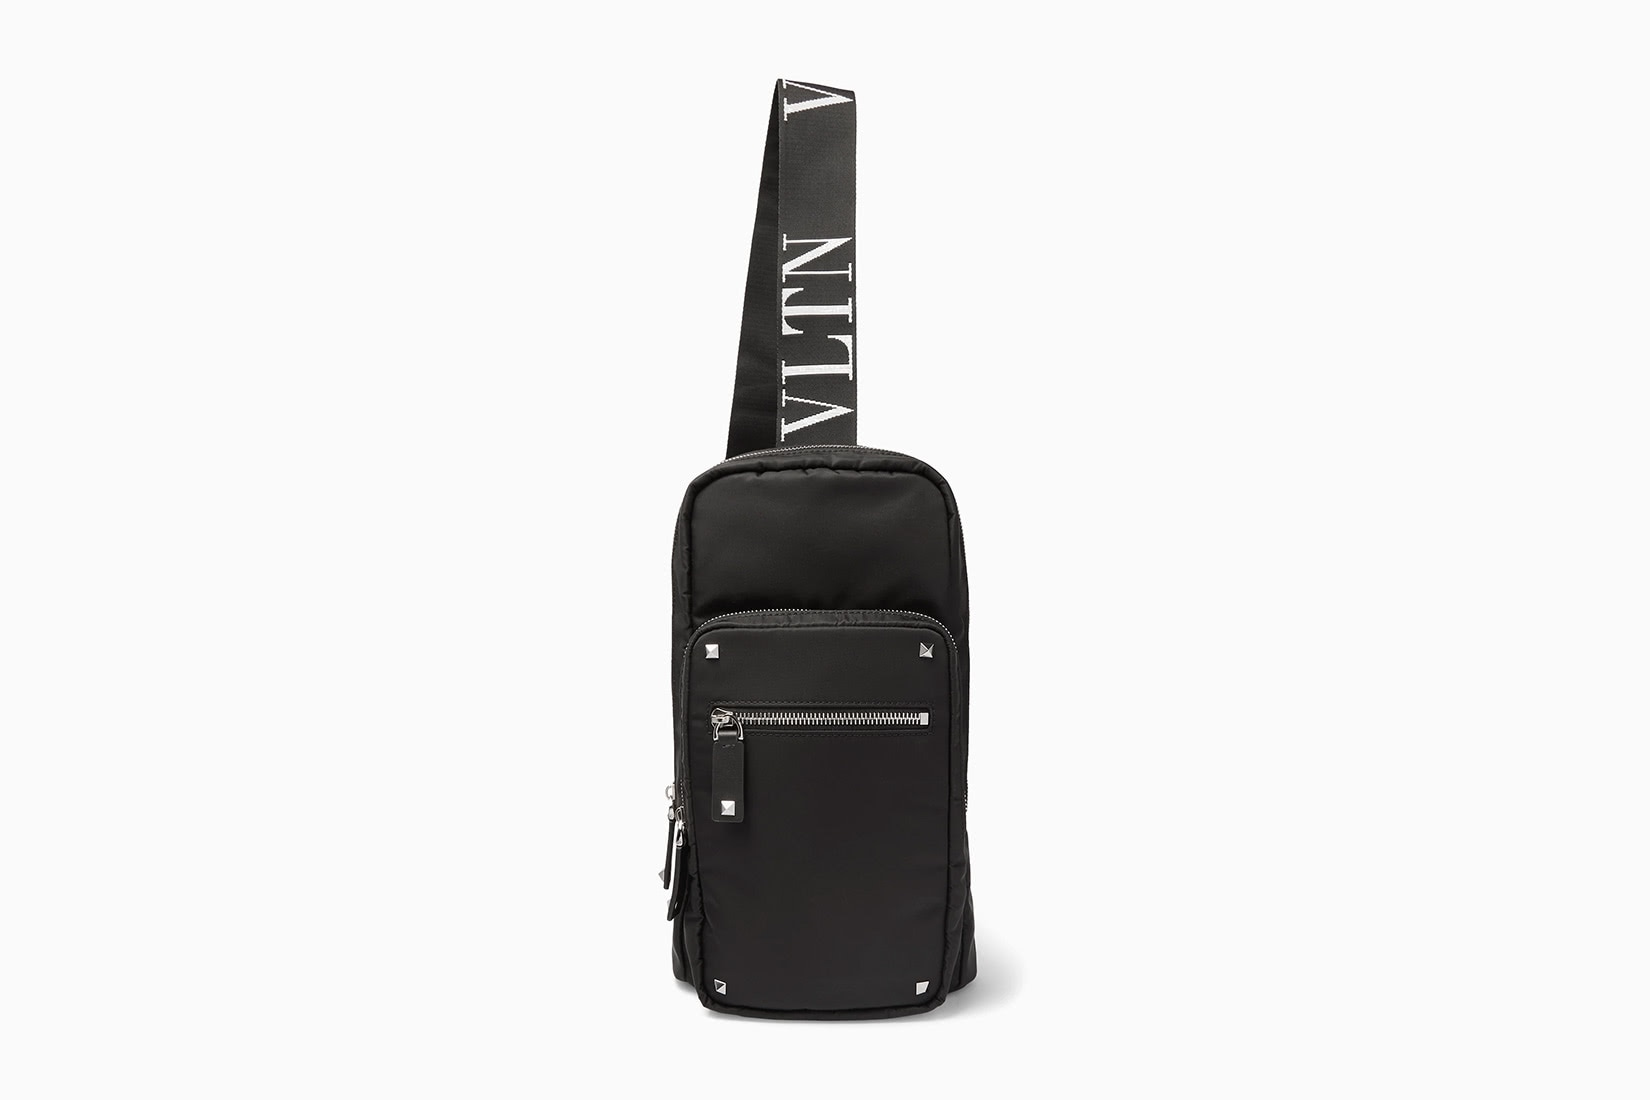 best sling bag valentino garavani - Luxe Digital